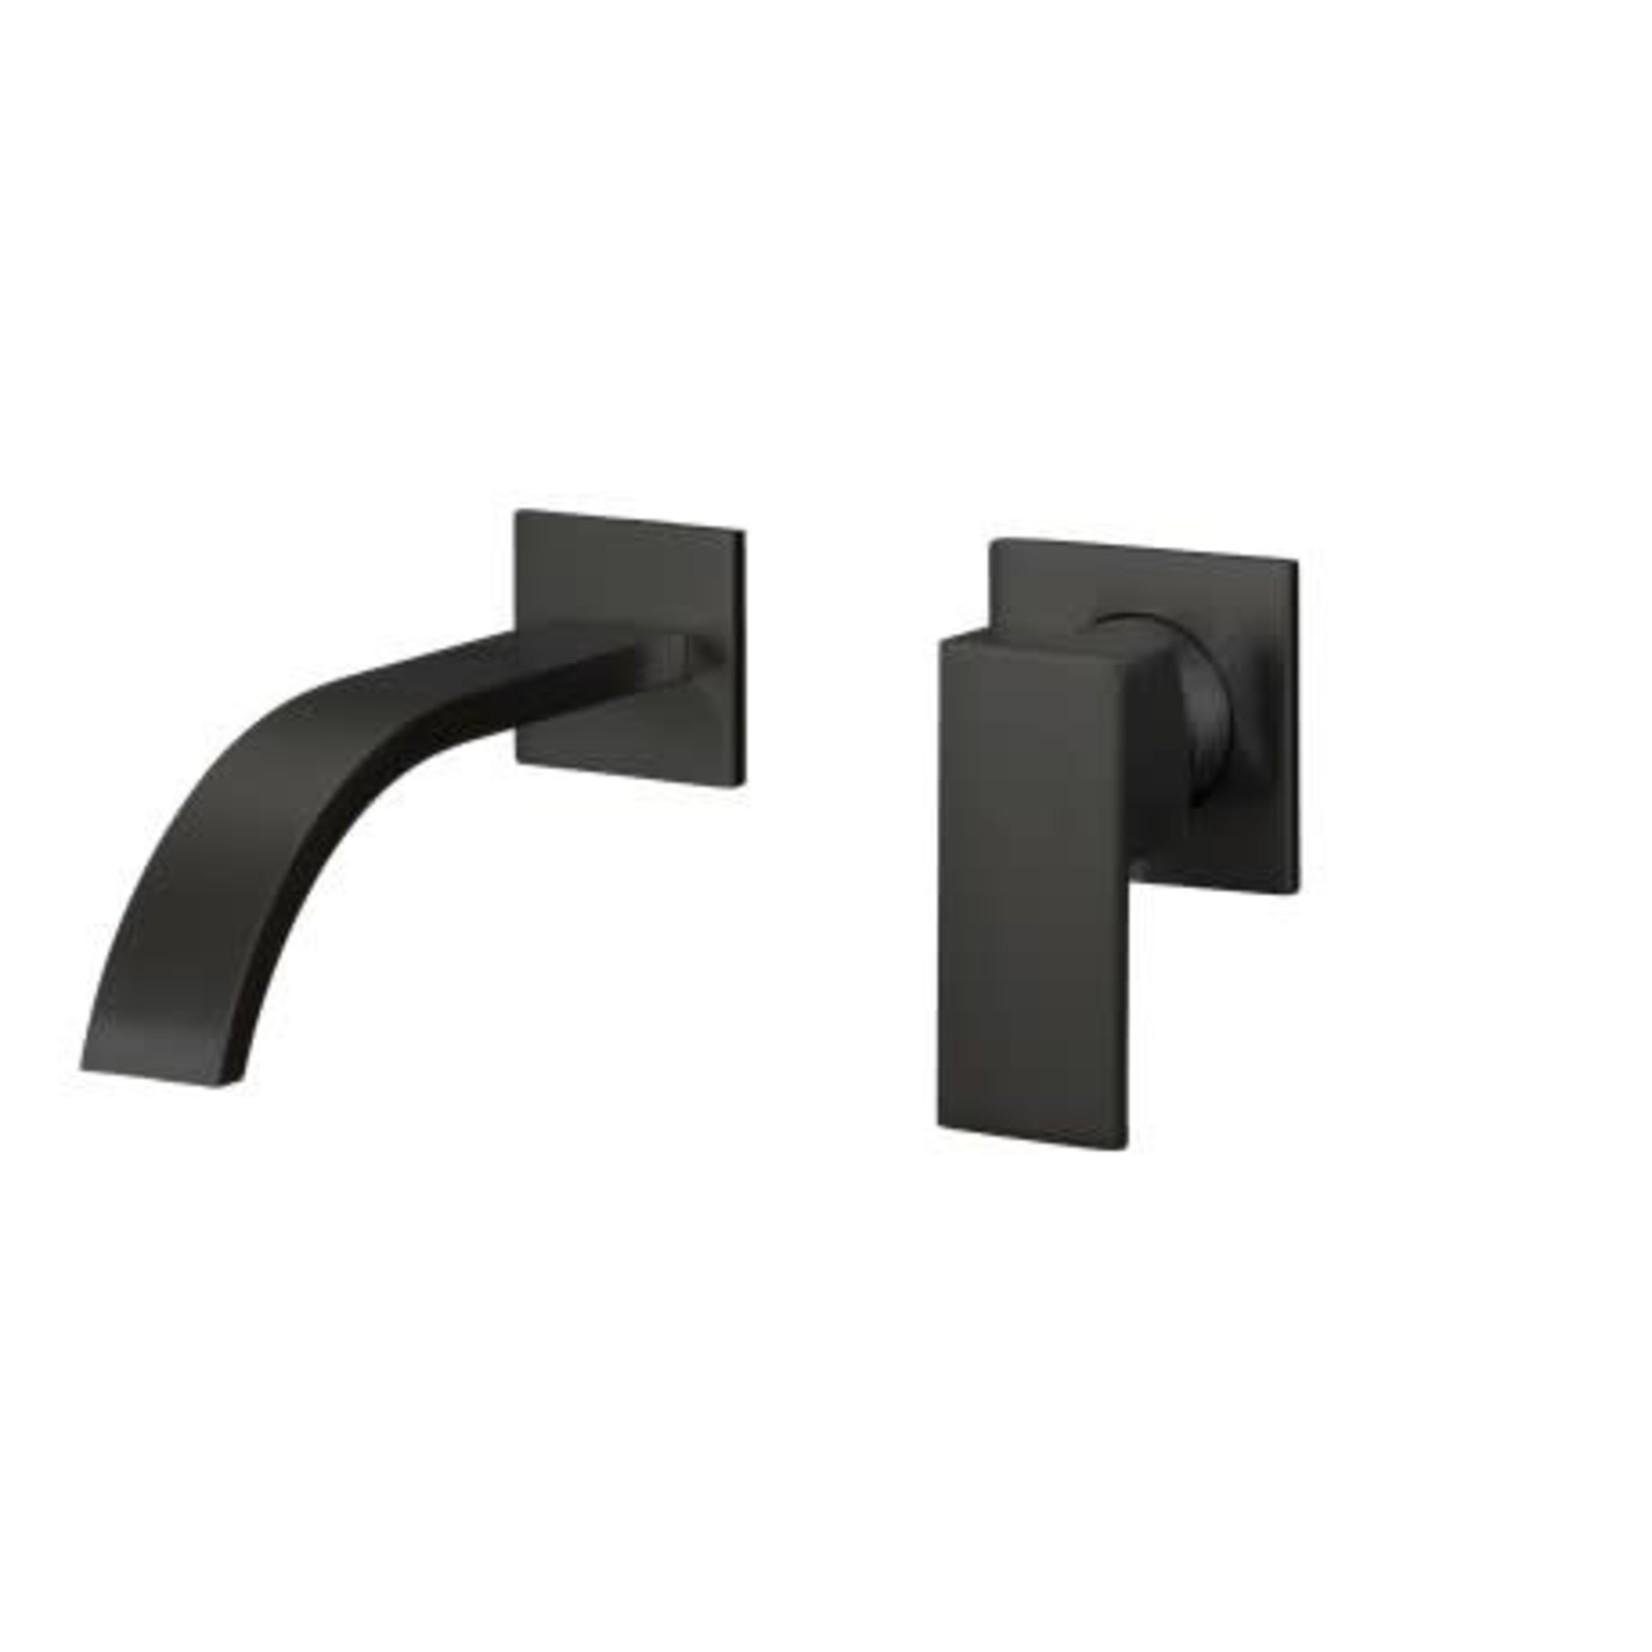 Robinet de lavabo mural Noir Mat 607-11